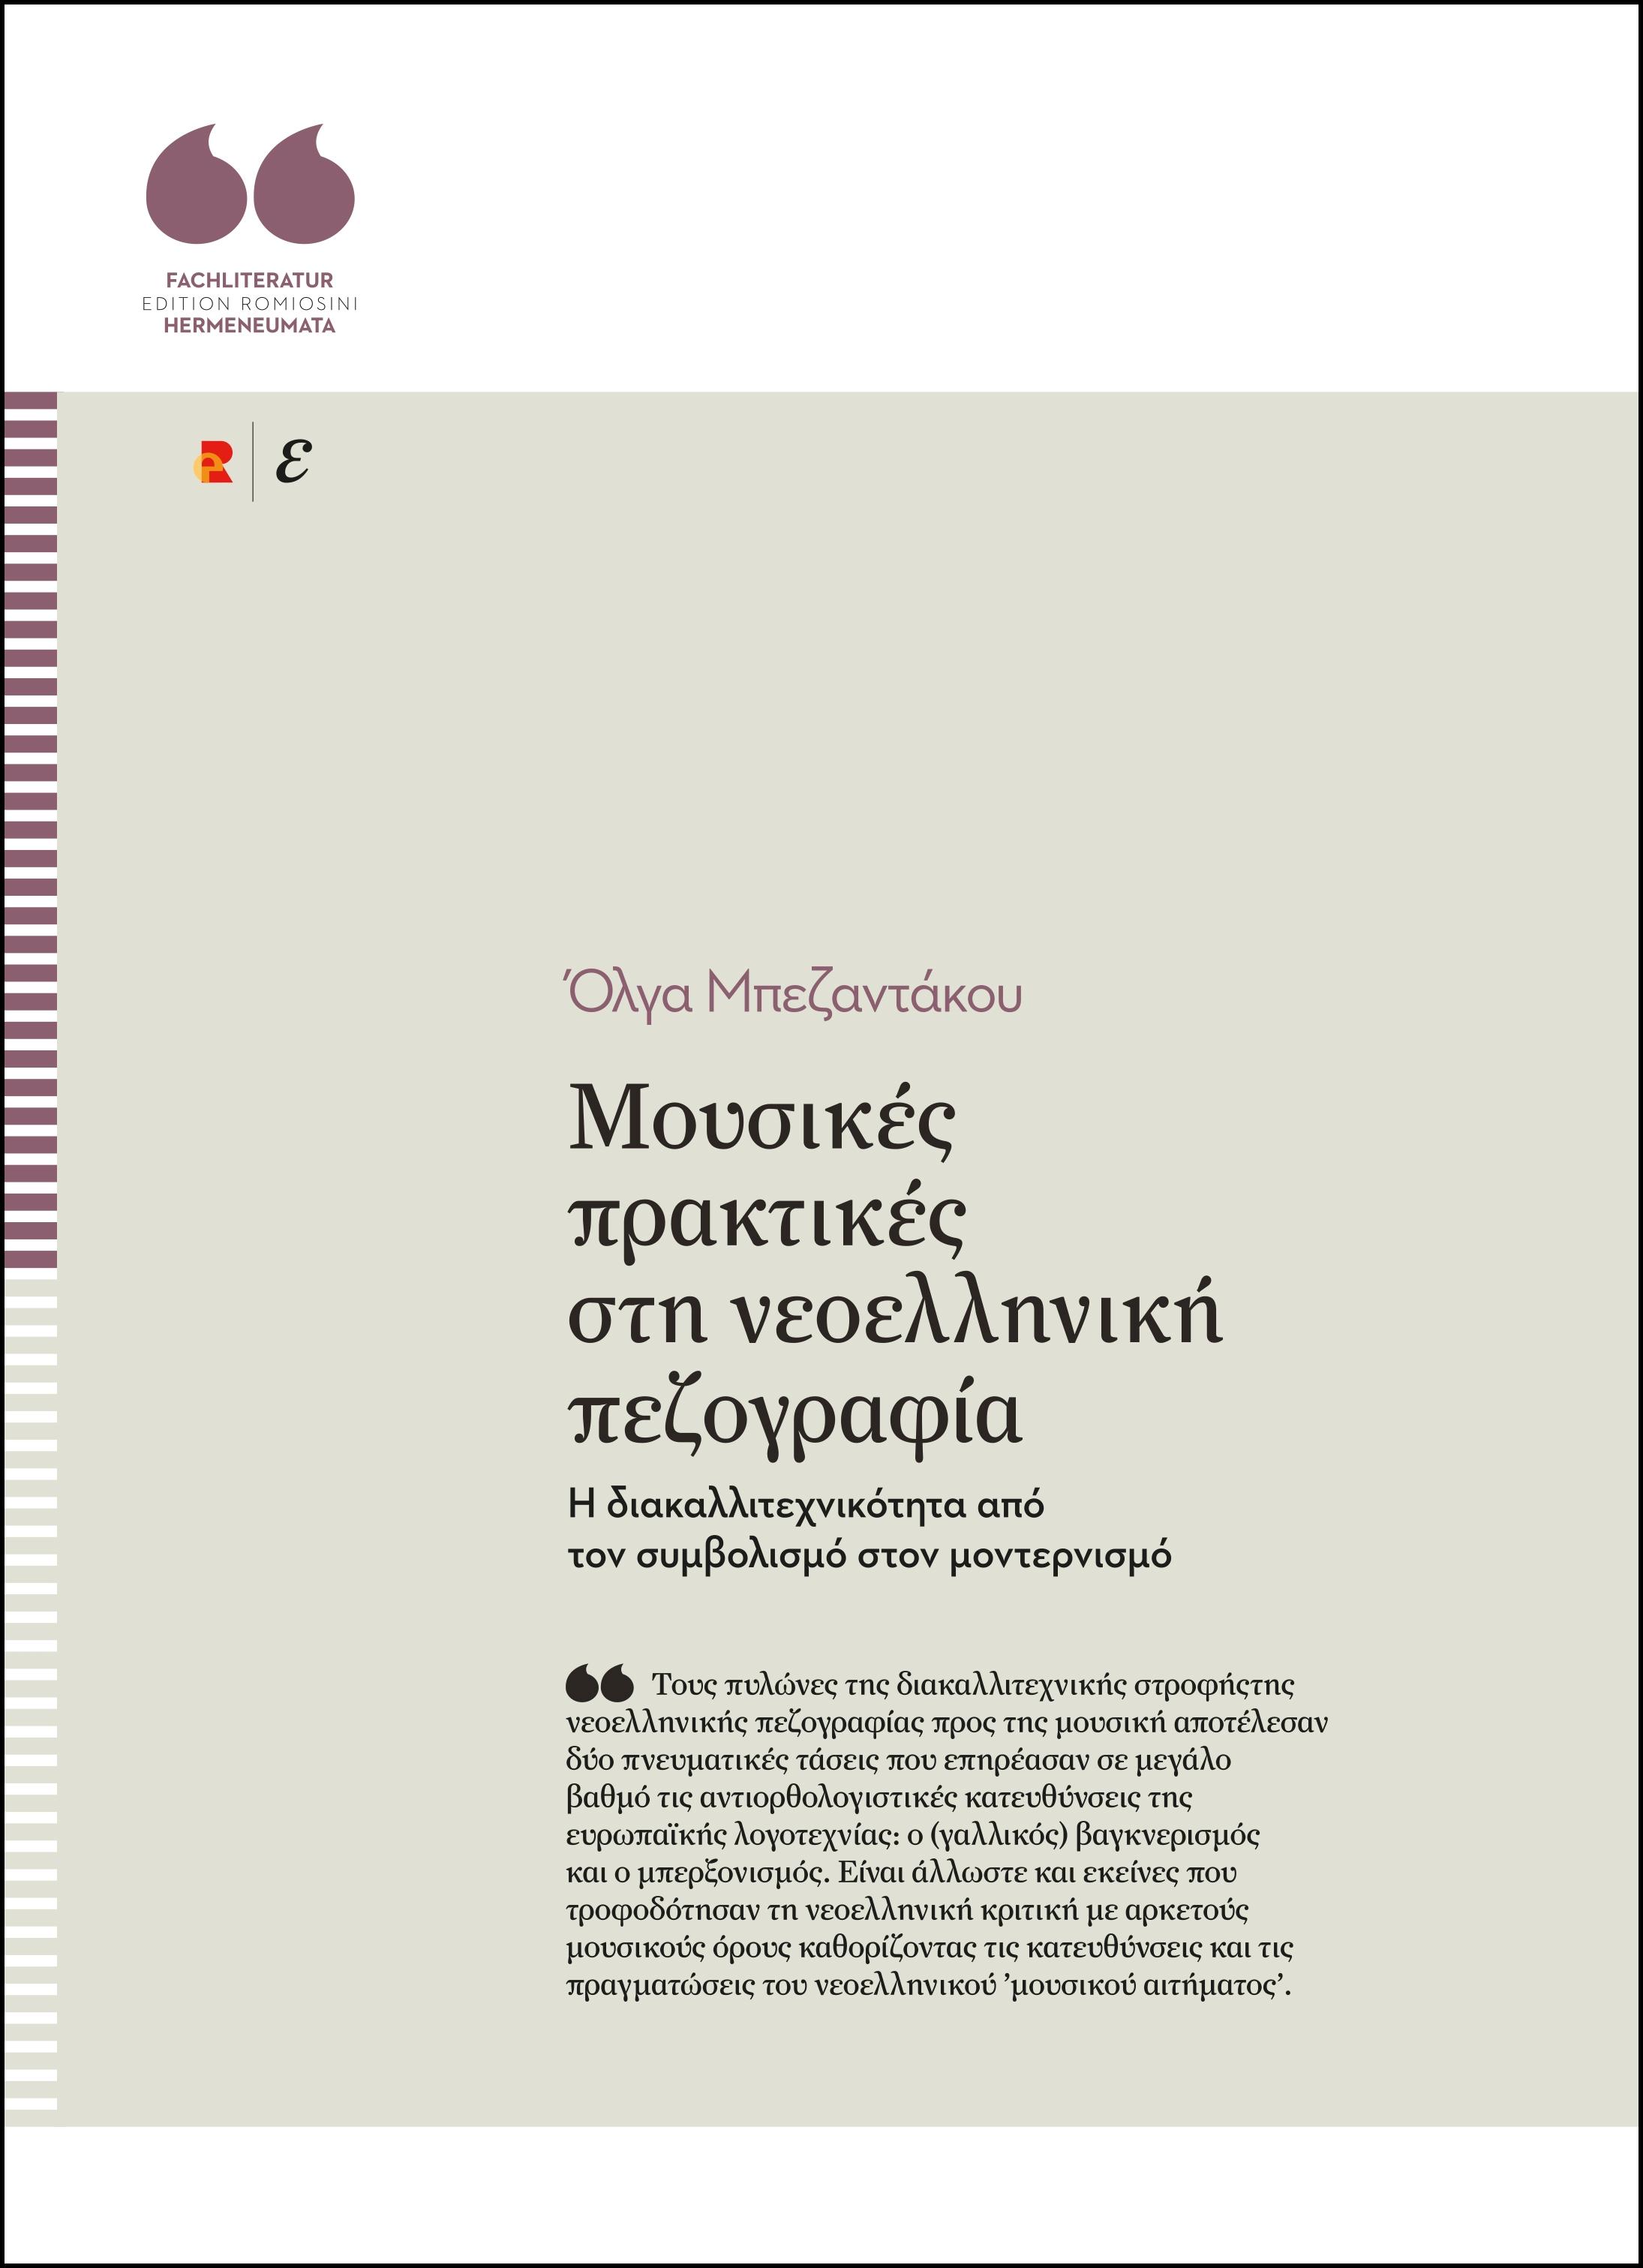 Titelbild für Μουσικές πρακτικές στη νεοελληνική πεζογραφία. Η διακαλλιτεχνικότητα από τον συμβολισμό στον μοντερνισμό